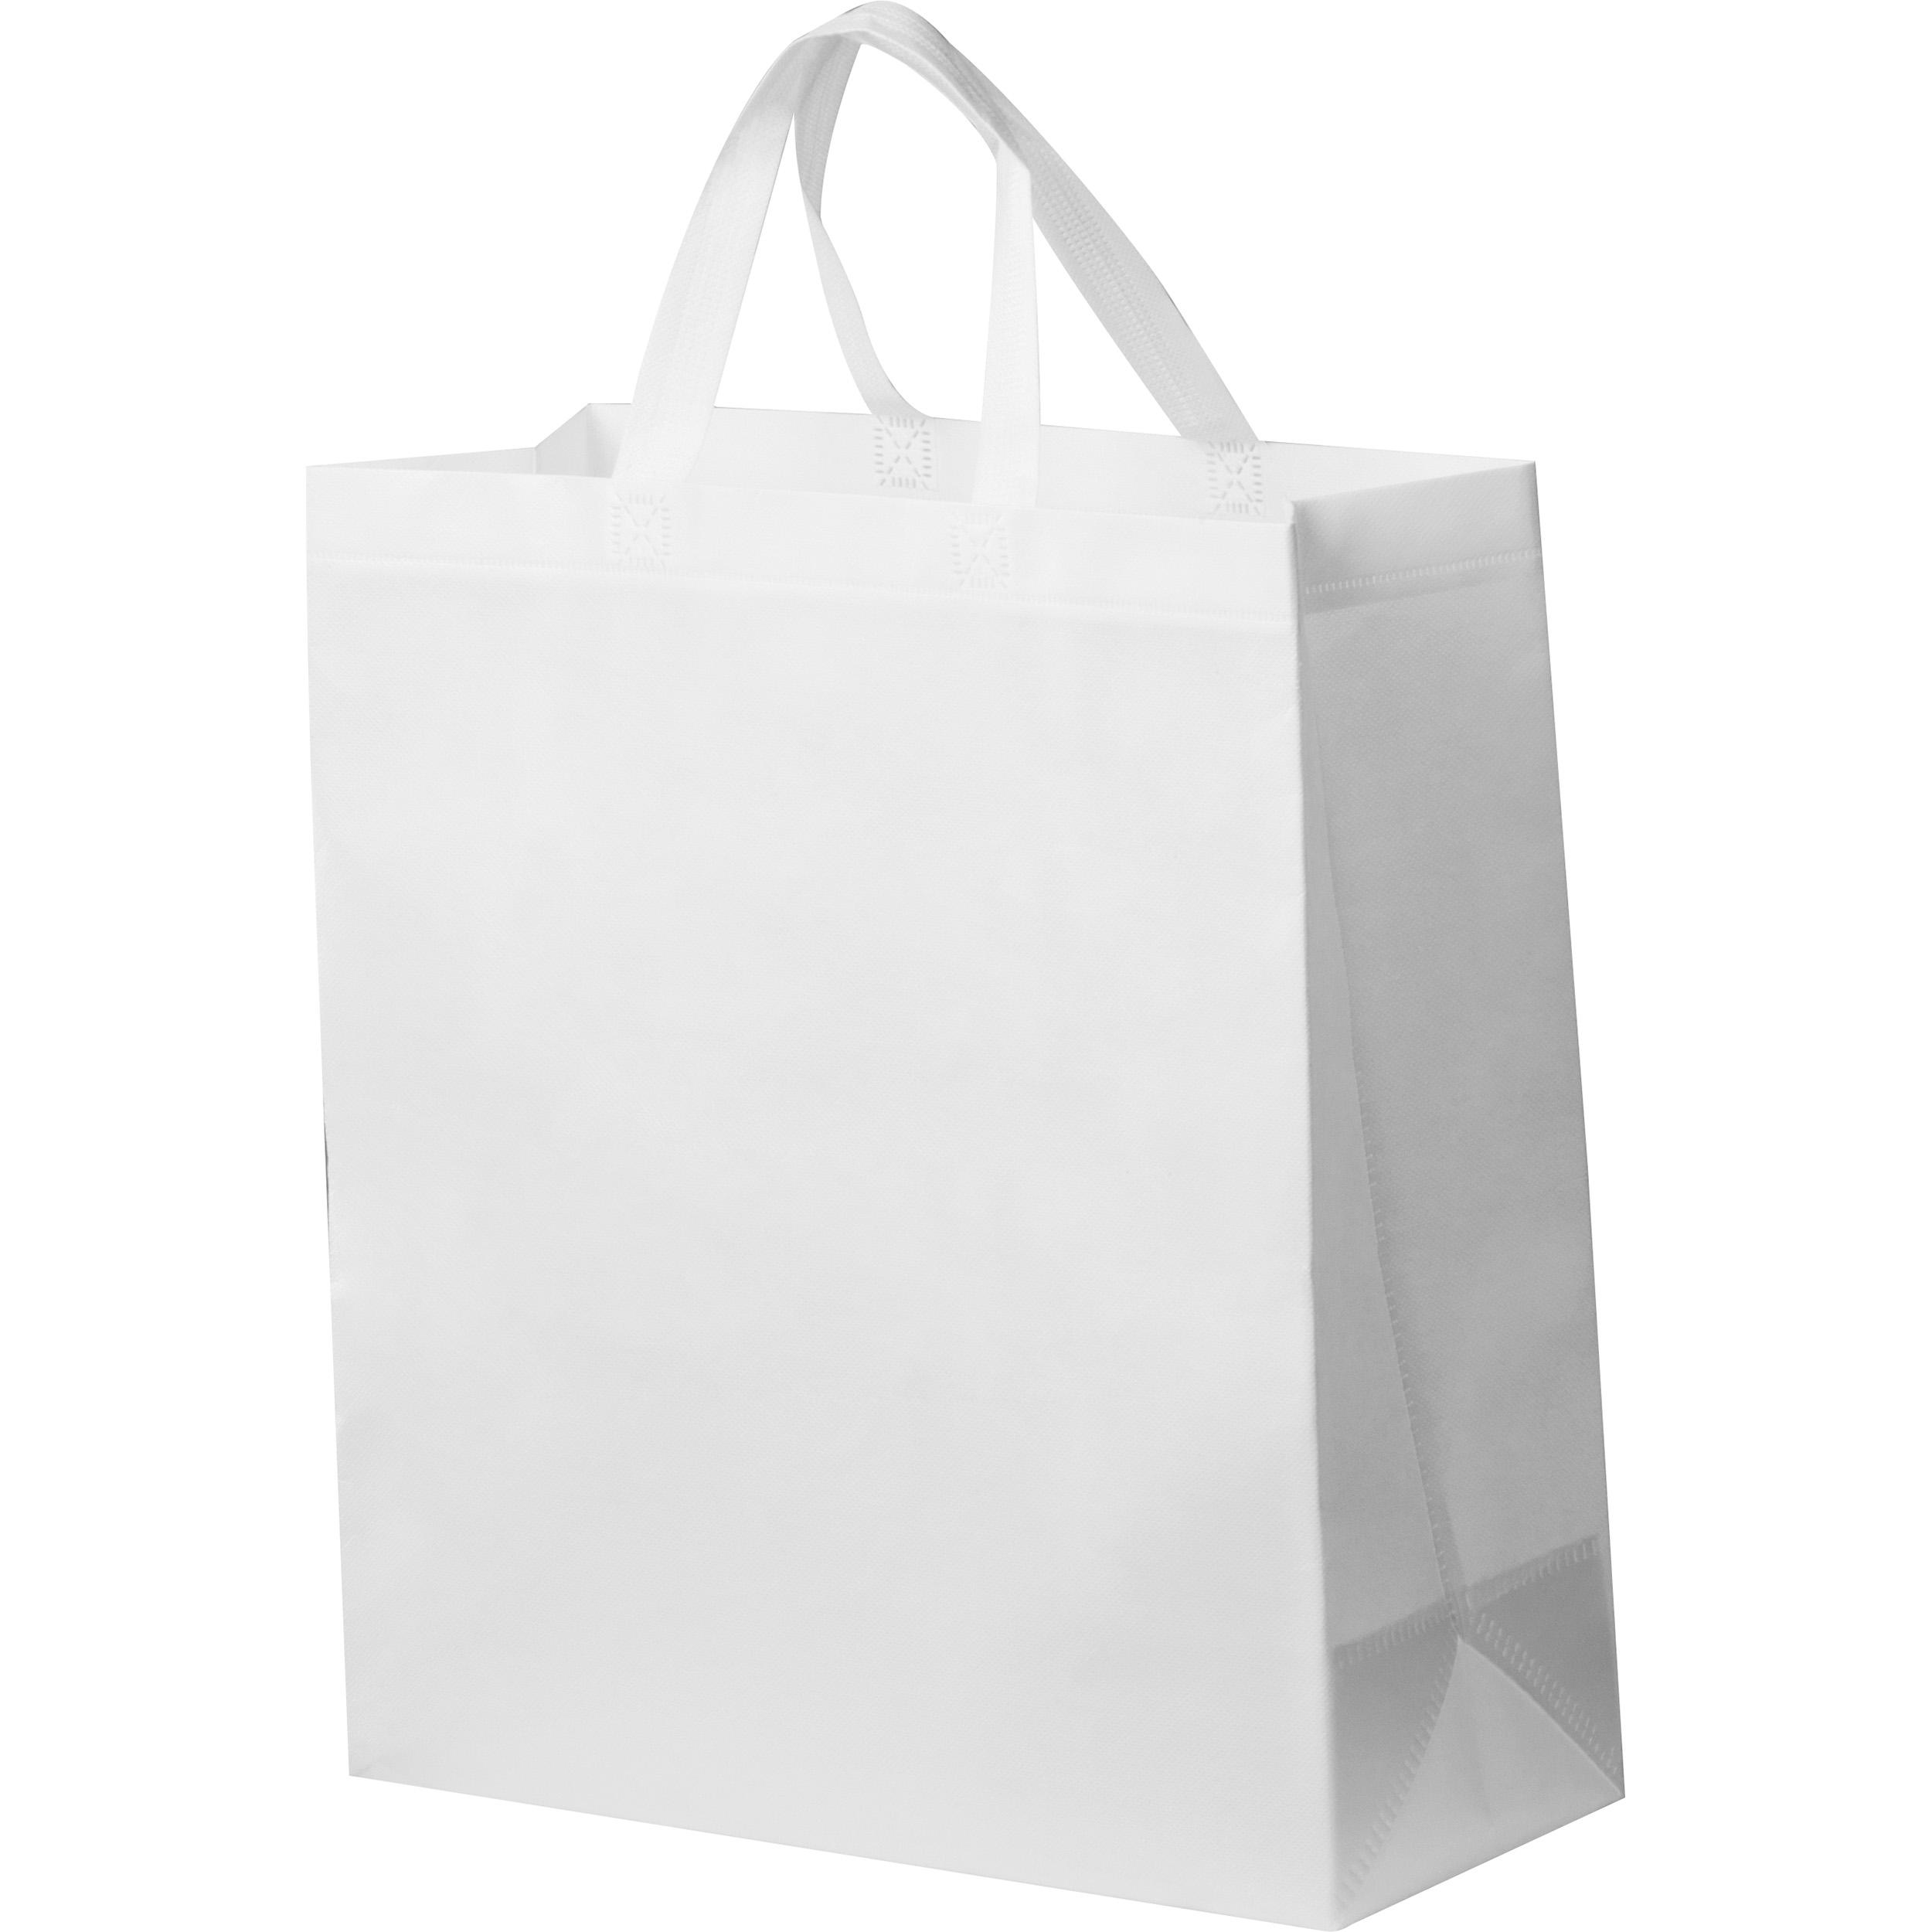 Non woven bag - large